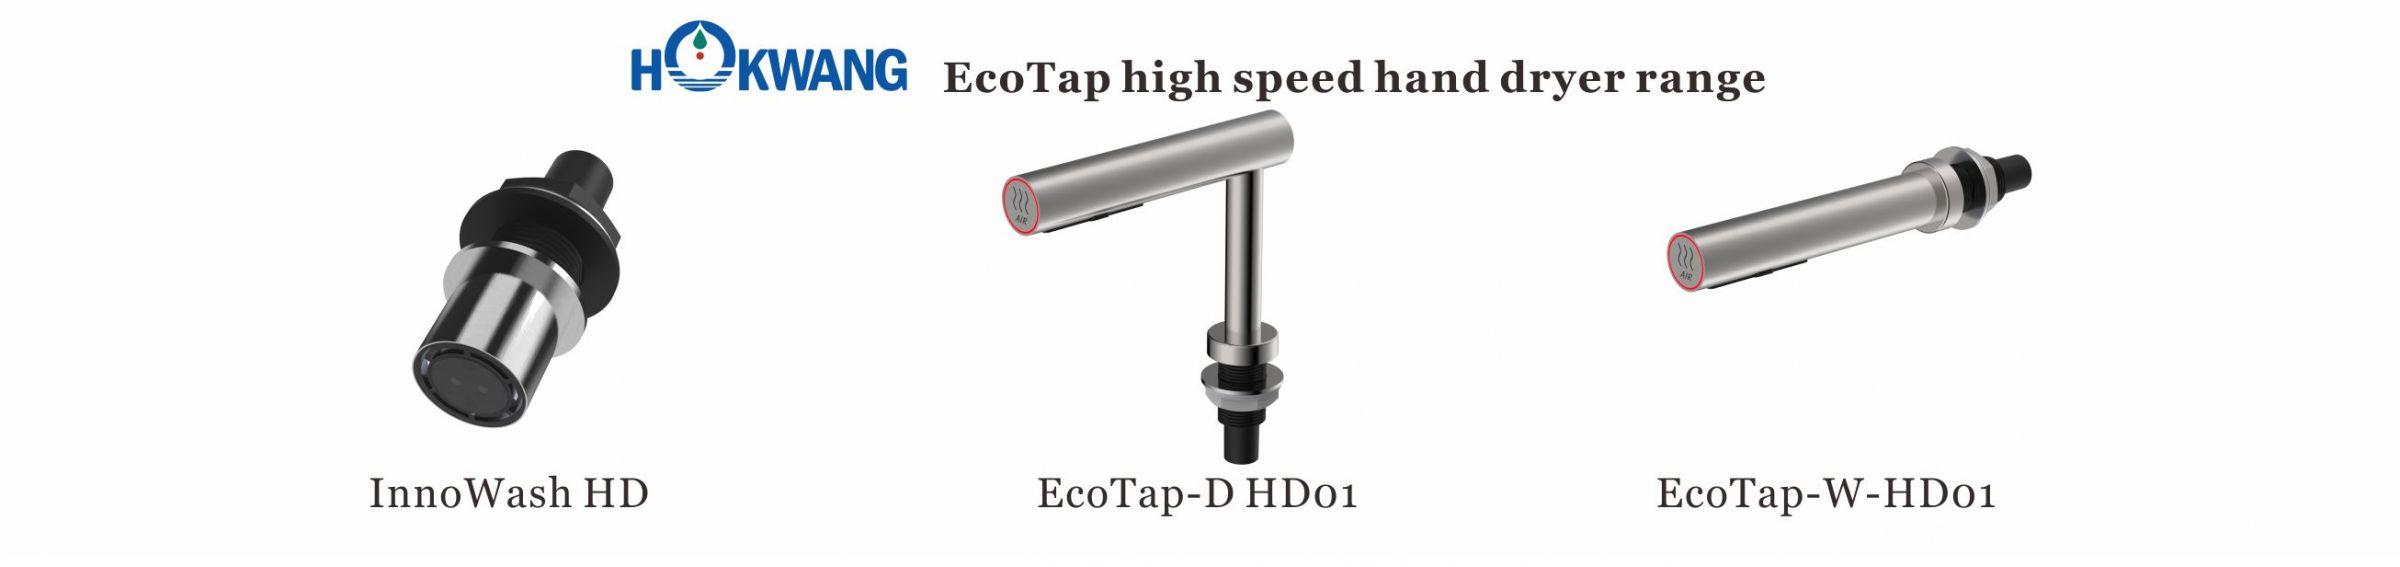 EcoTap Pengering Tangan Berkecepatan Tinggi